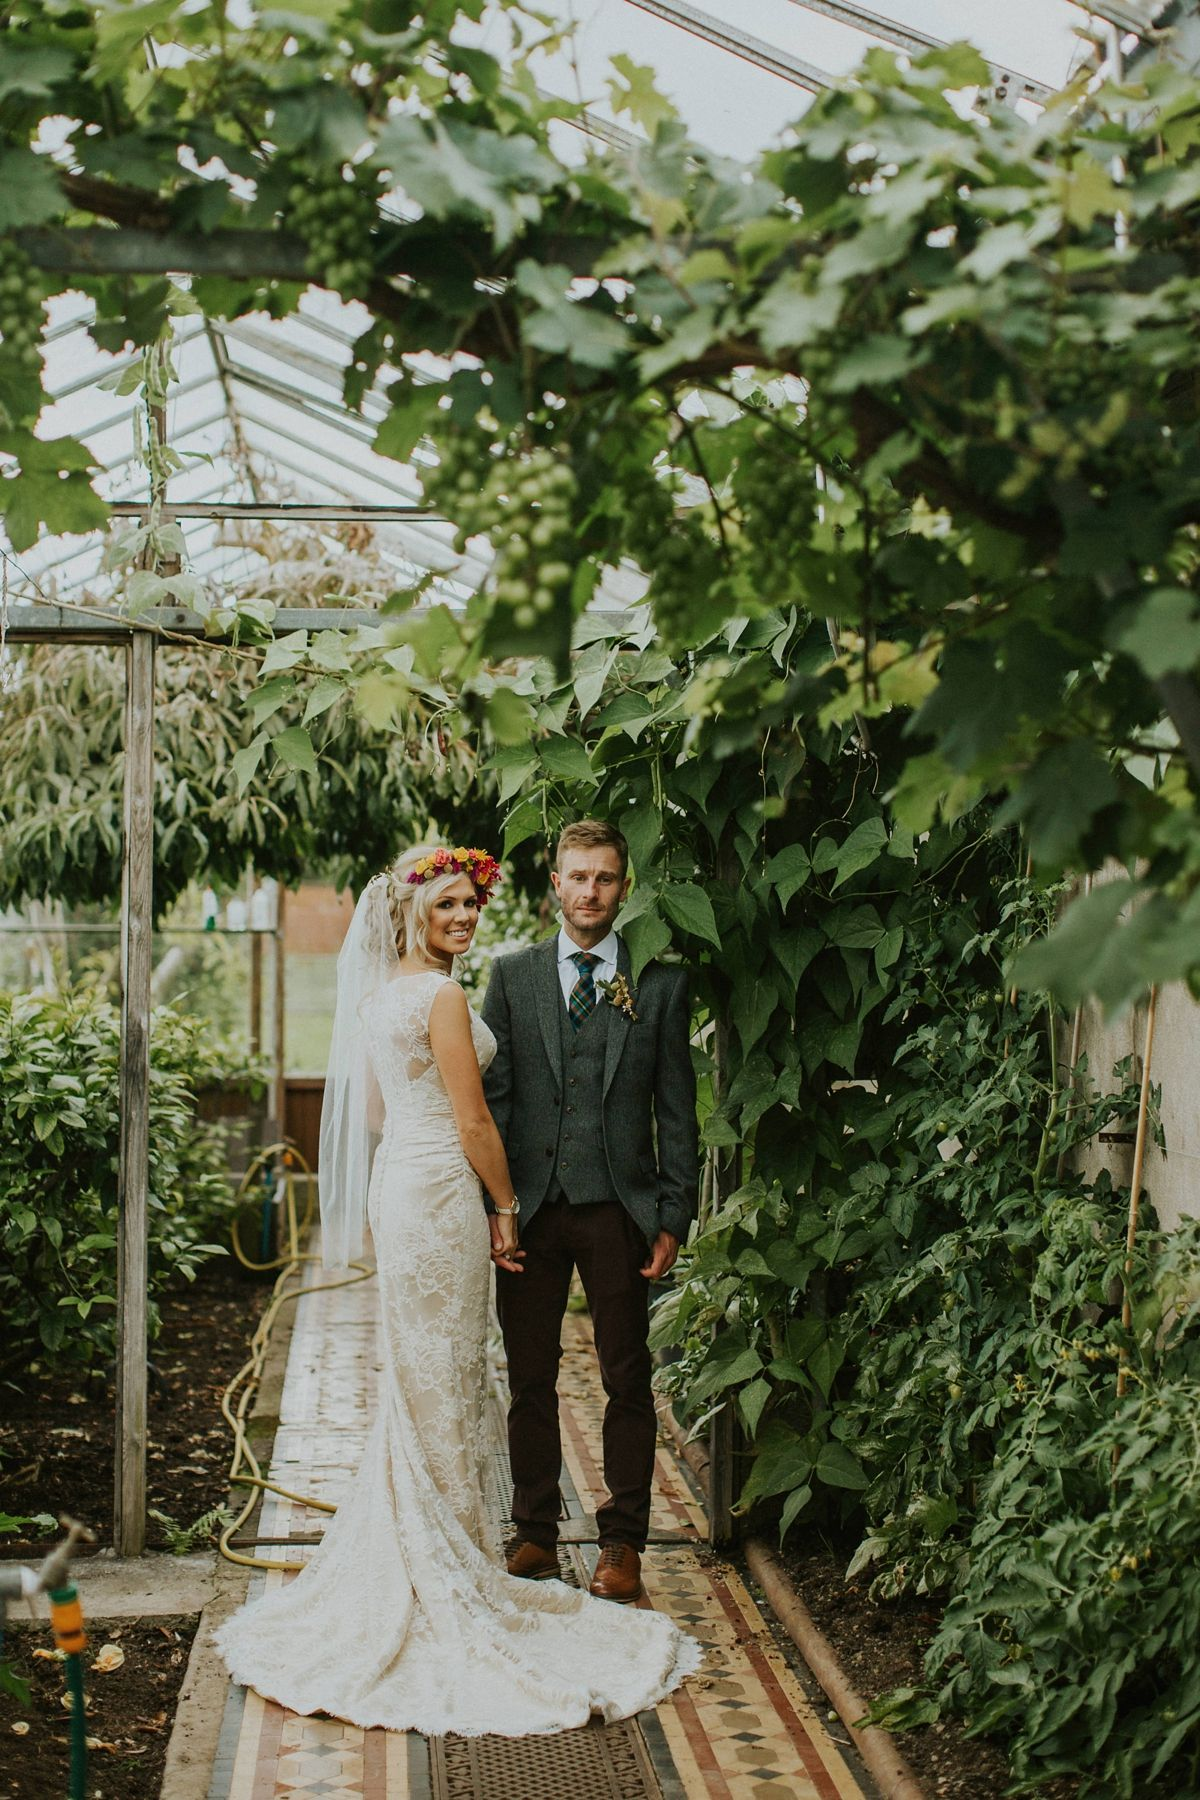 scottish wedding traditions handfasting